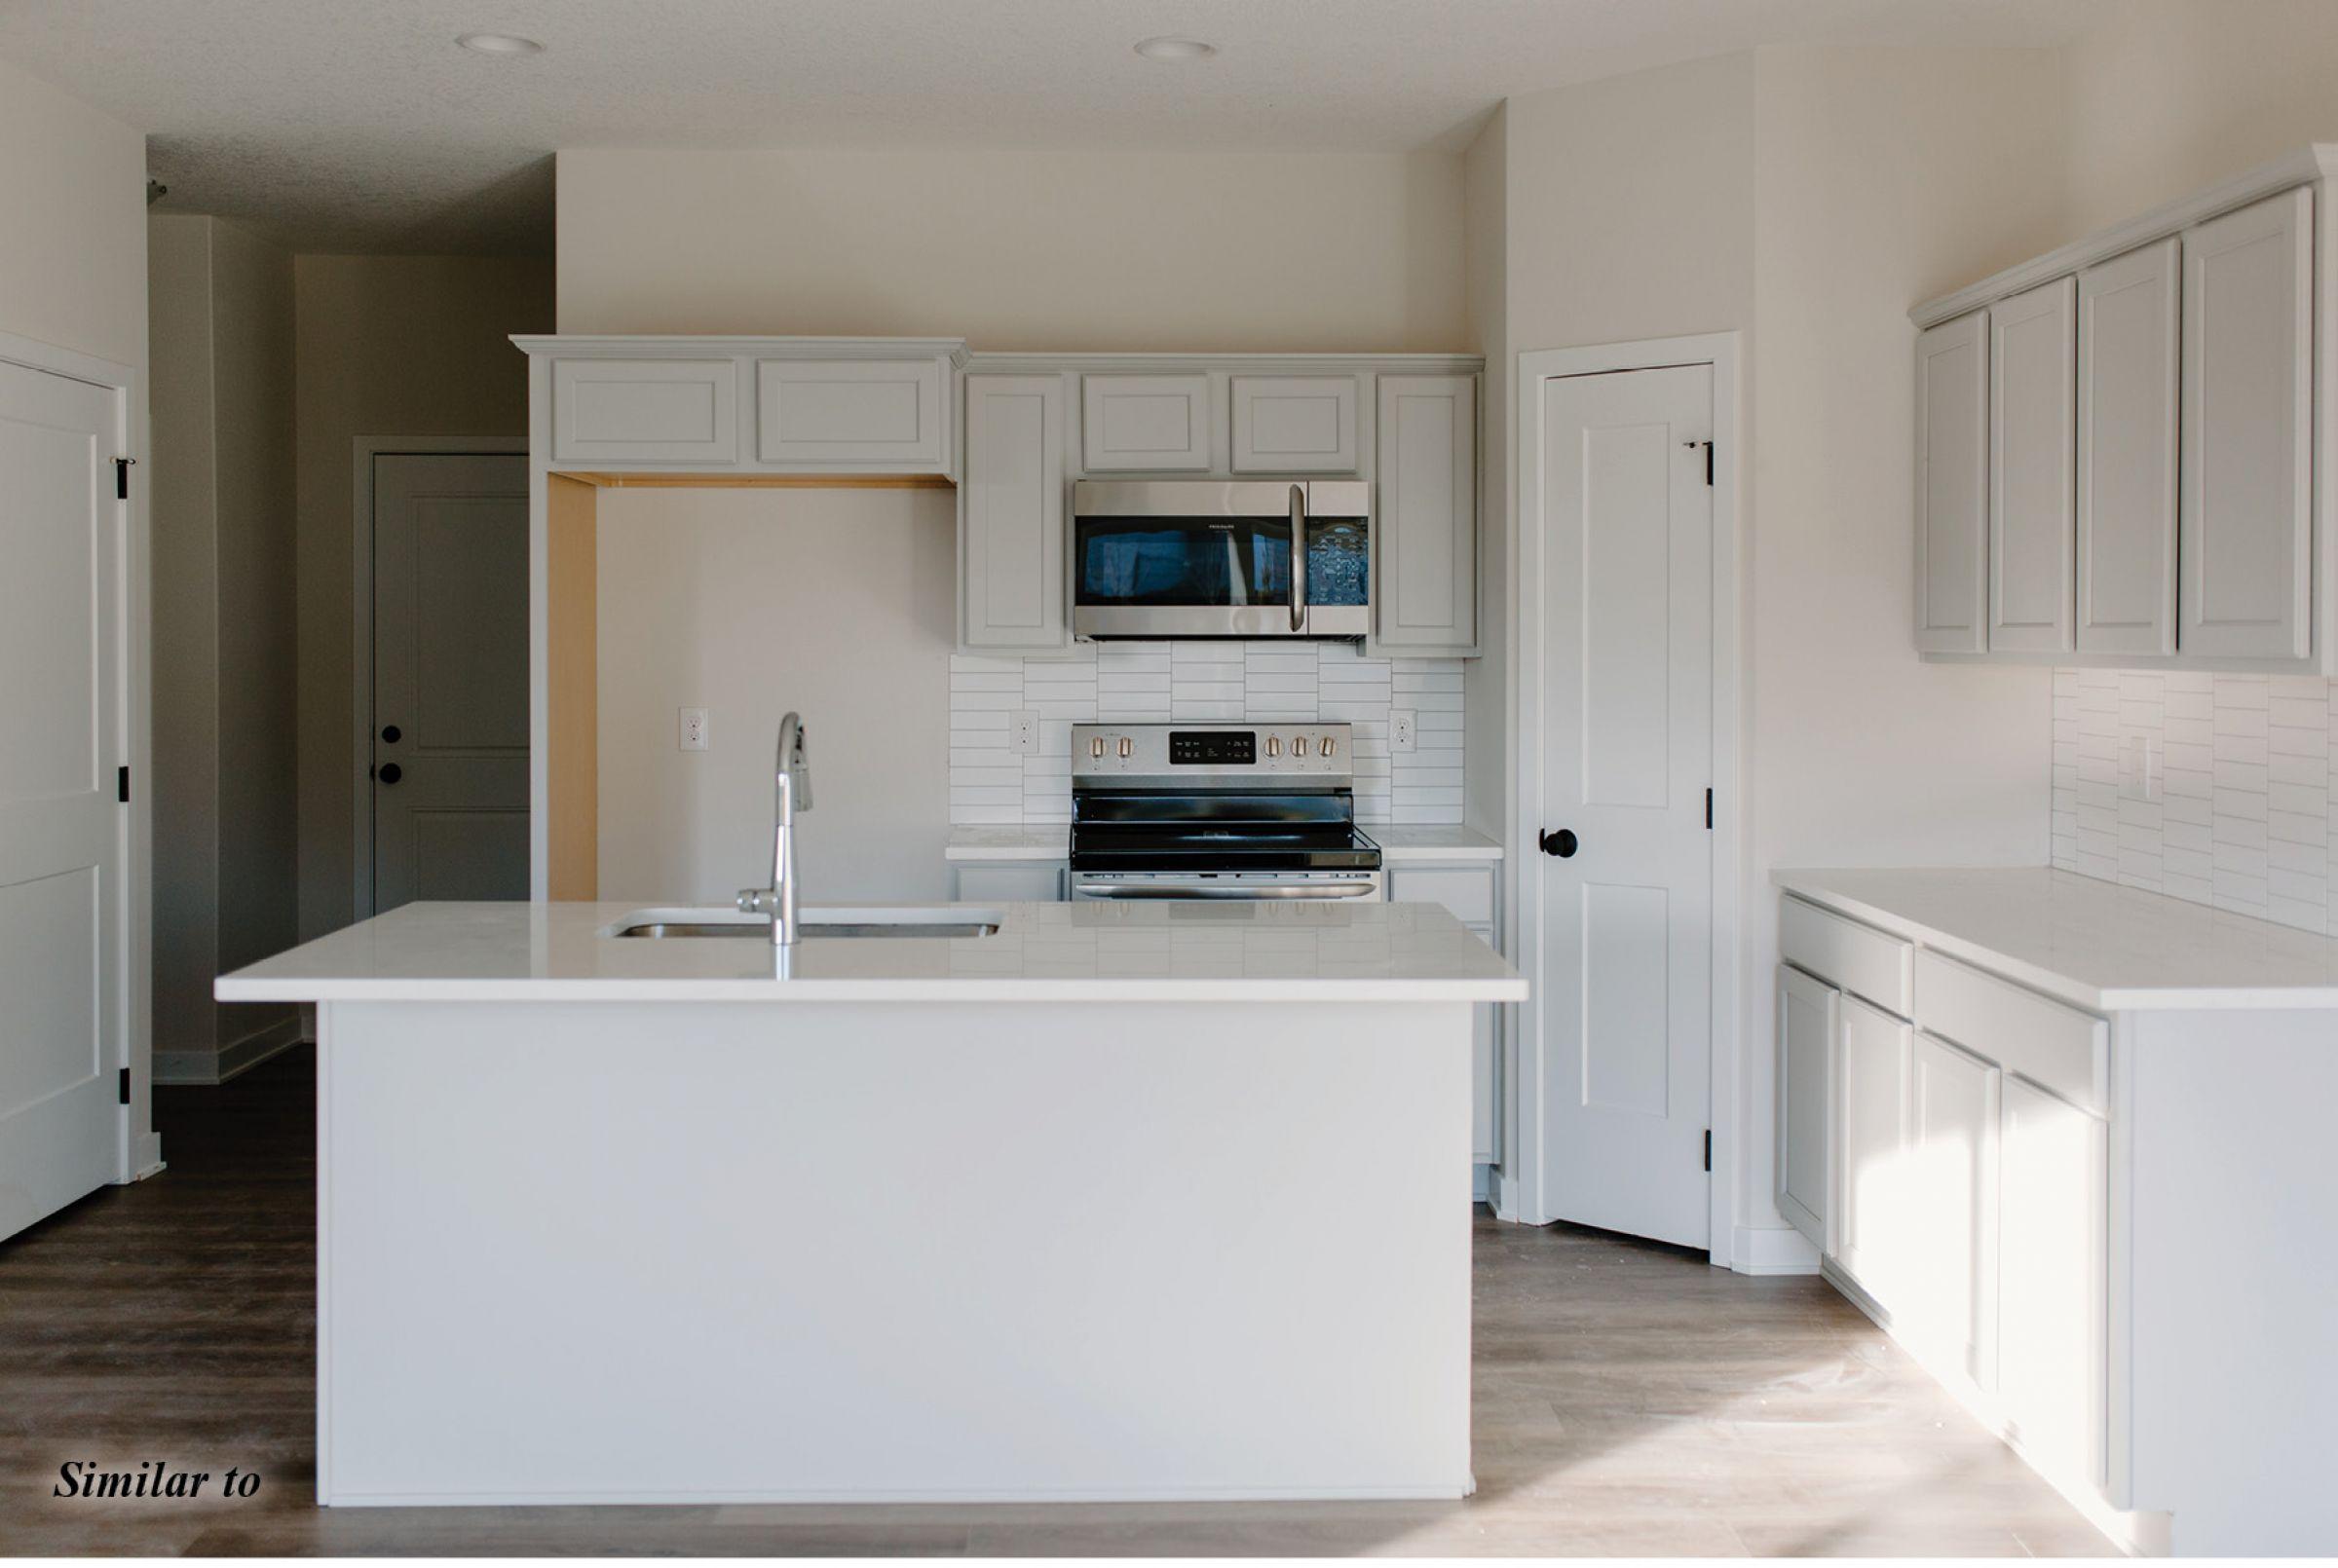 residential-warren-county-iowa-0-acres-listing-number-15677-2-2021-08-06-160505.jpg